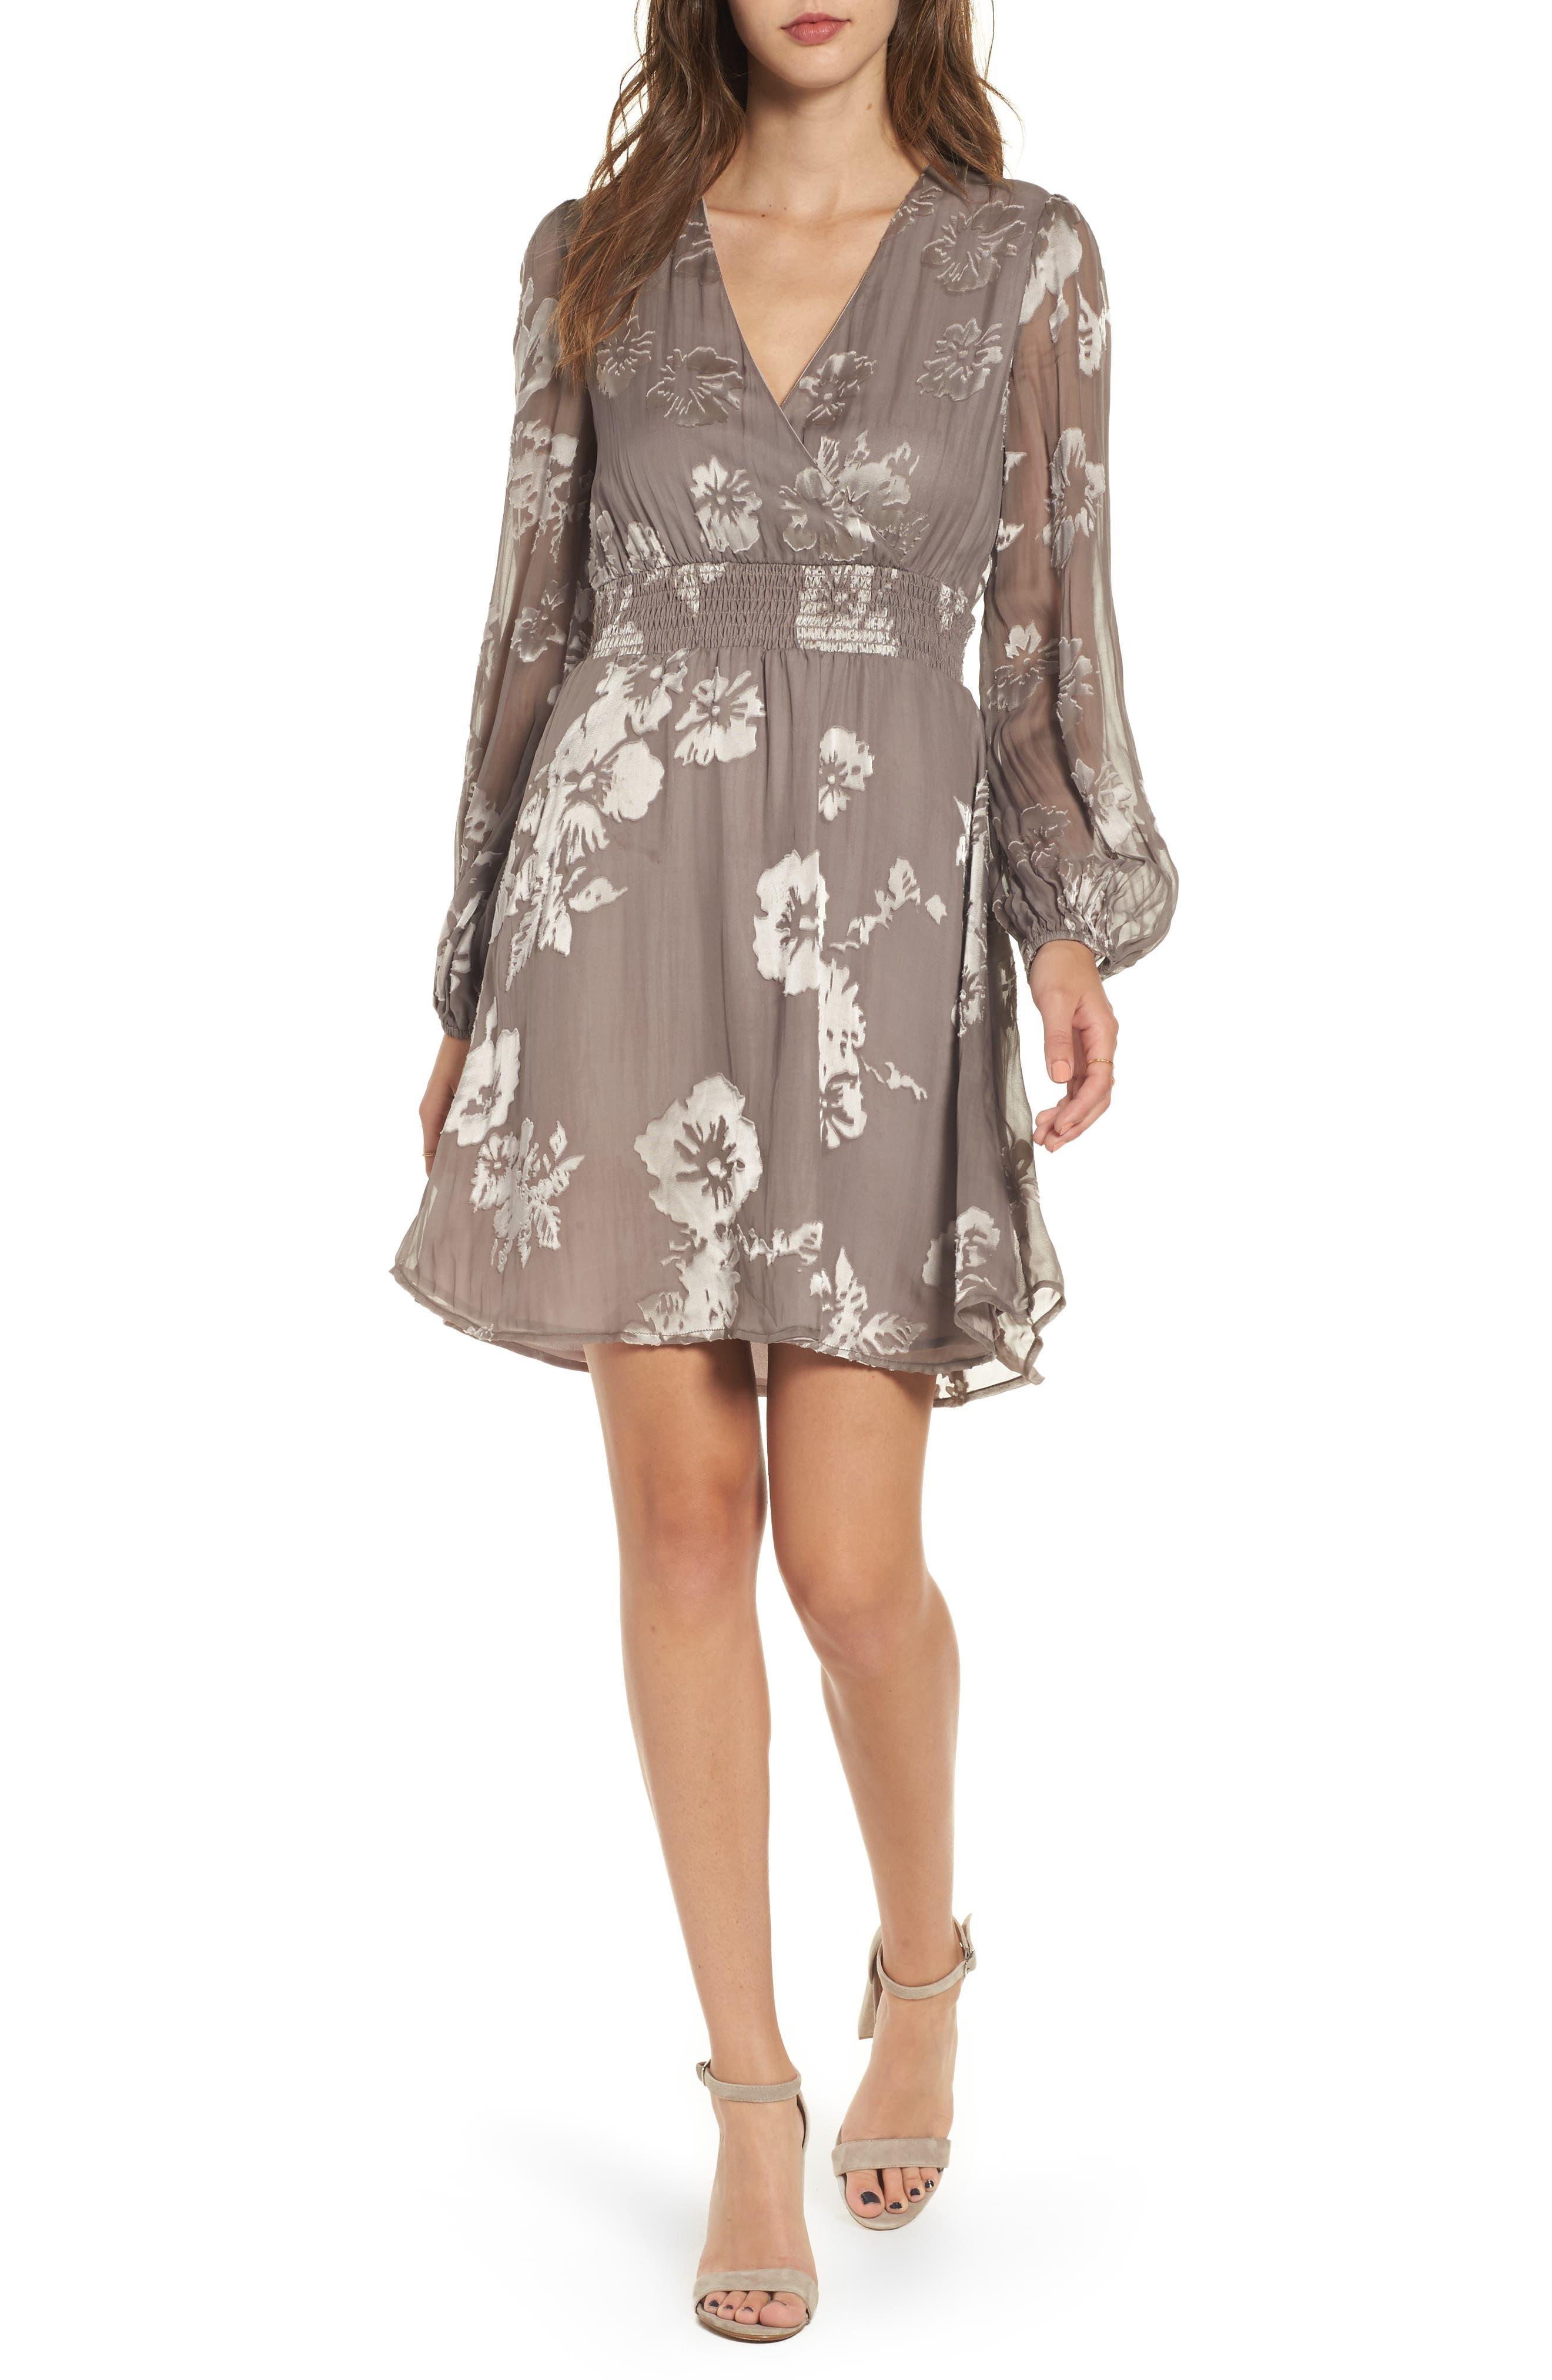 Main Image - ASTR the Label Mabeline Fit & Flare Dress